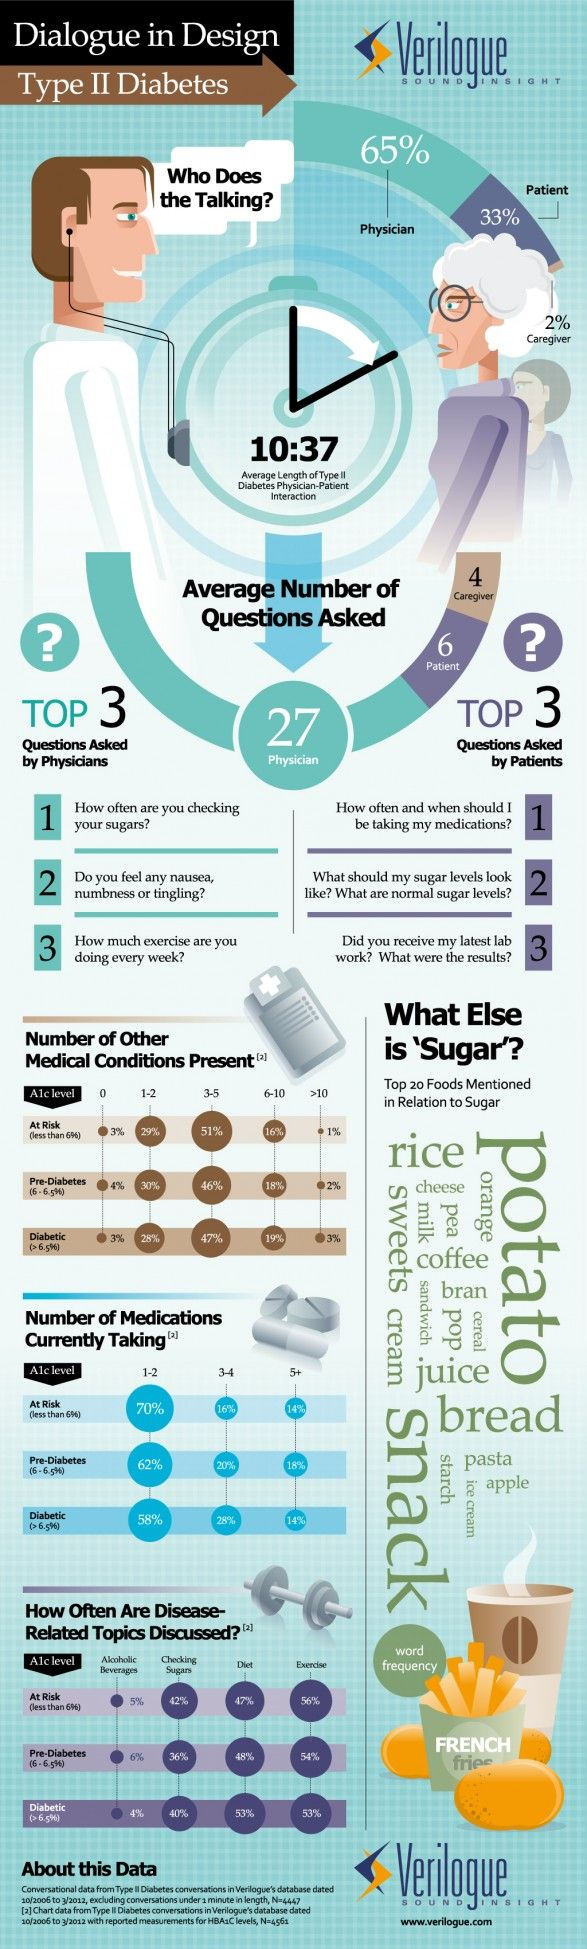 Type II Diabetes: Dialogue in Design (infographics)